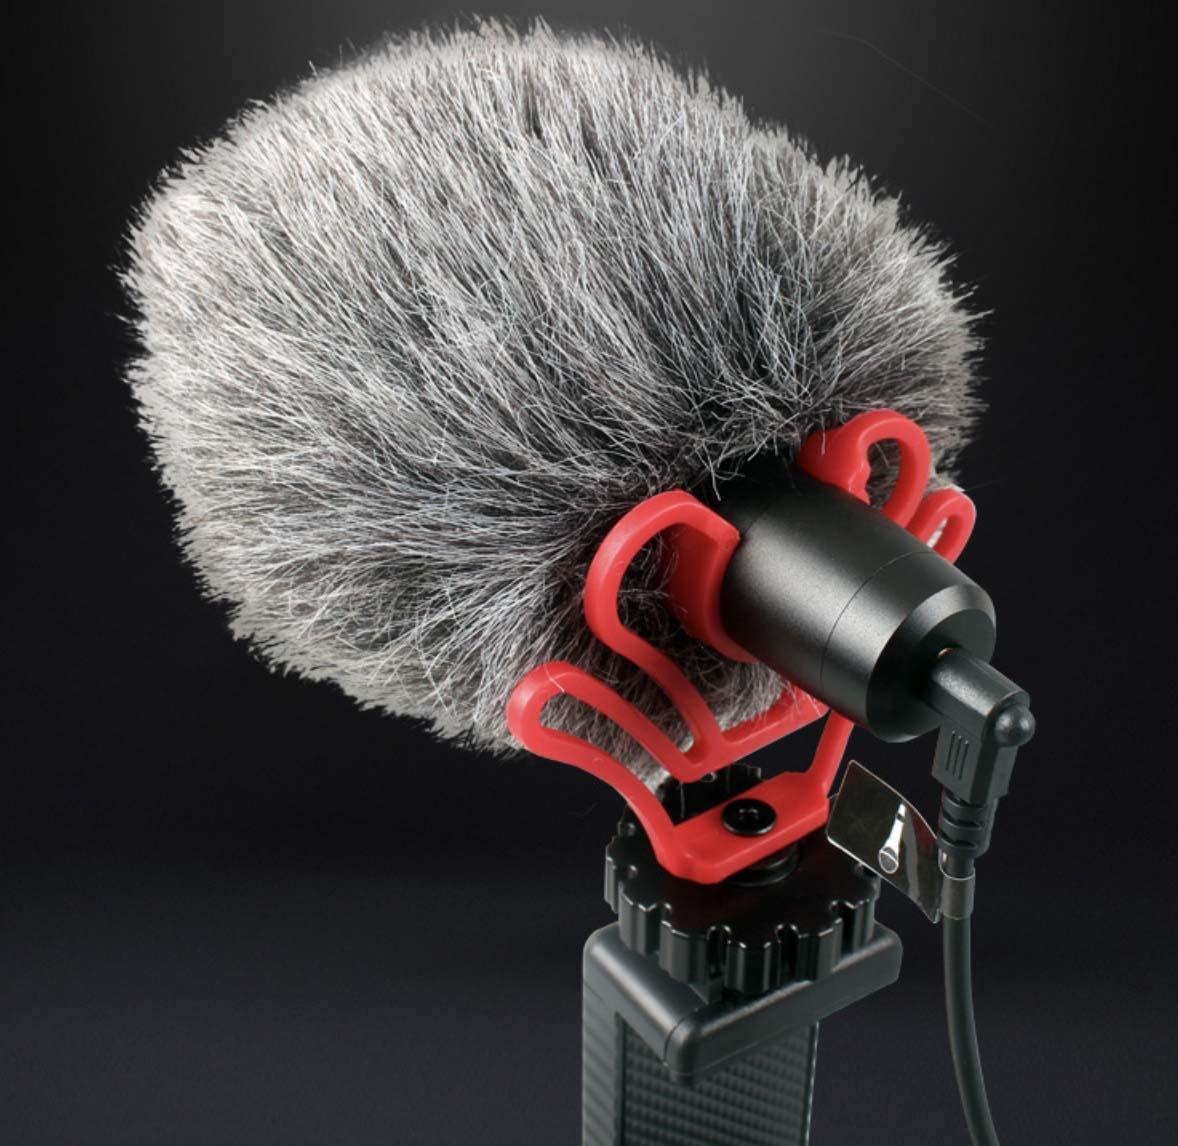 mikrofon do kamery, gopro